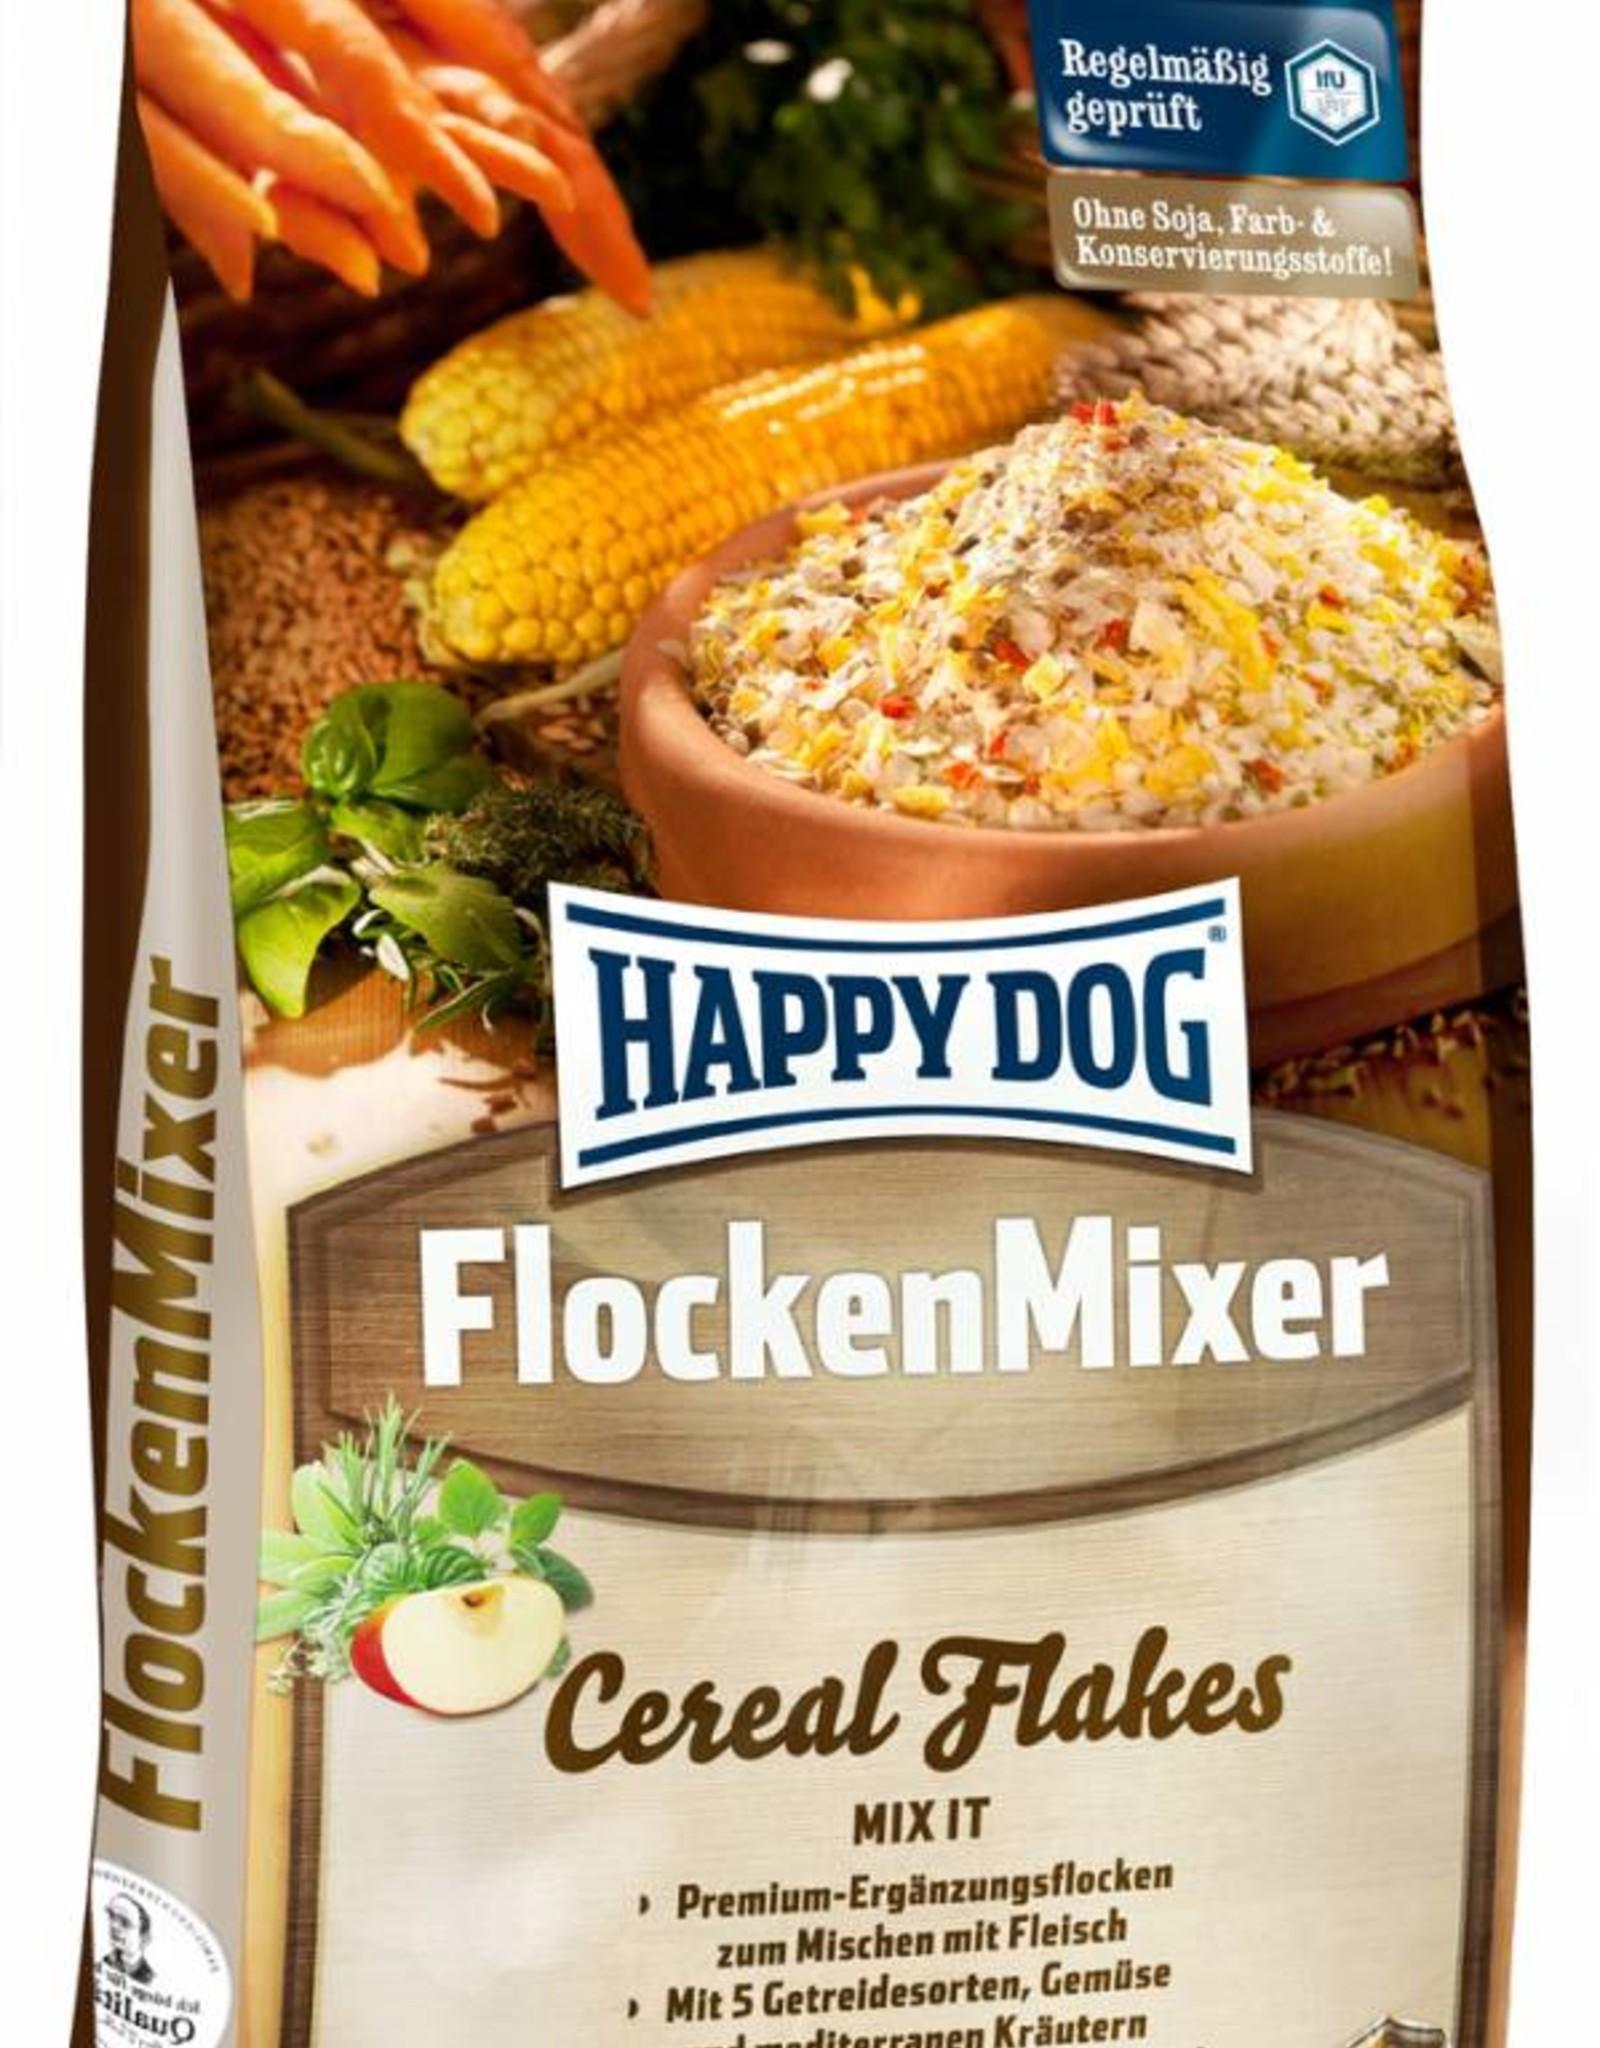 Happy Dog FlockenMixer